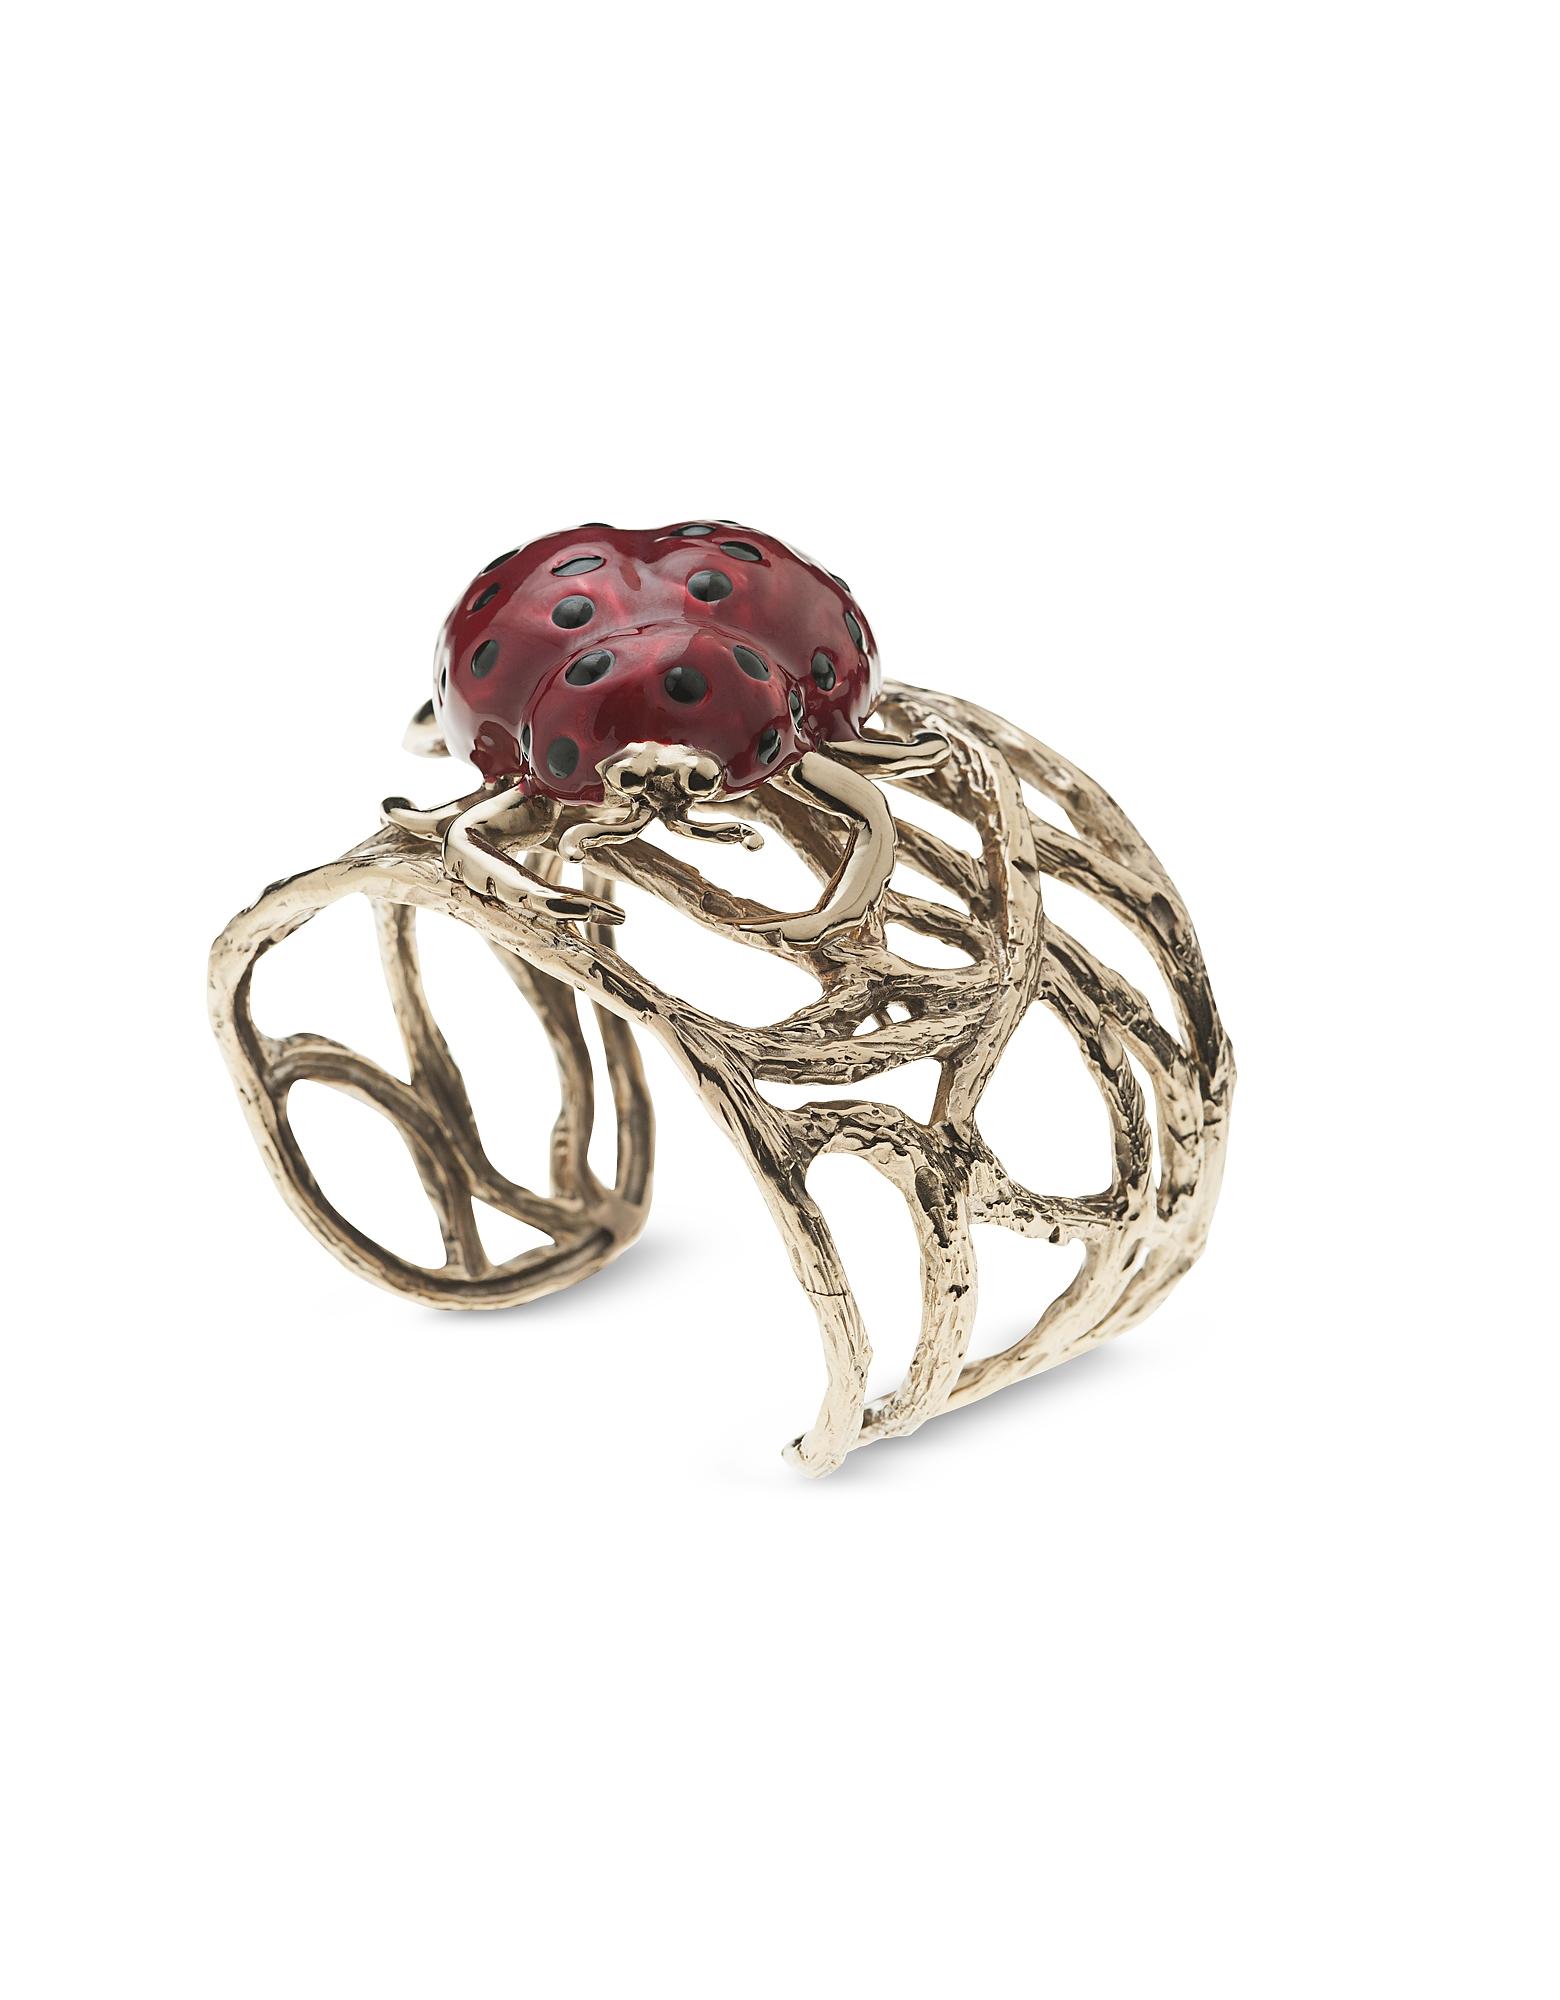 Bronze Branches Cuff Bracelet w/ Enamelled Ladybird